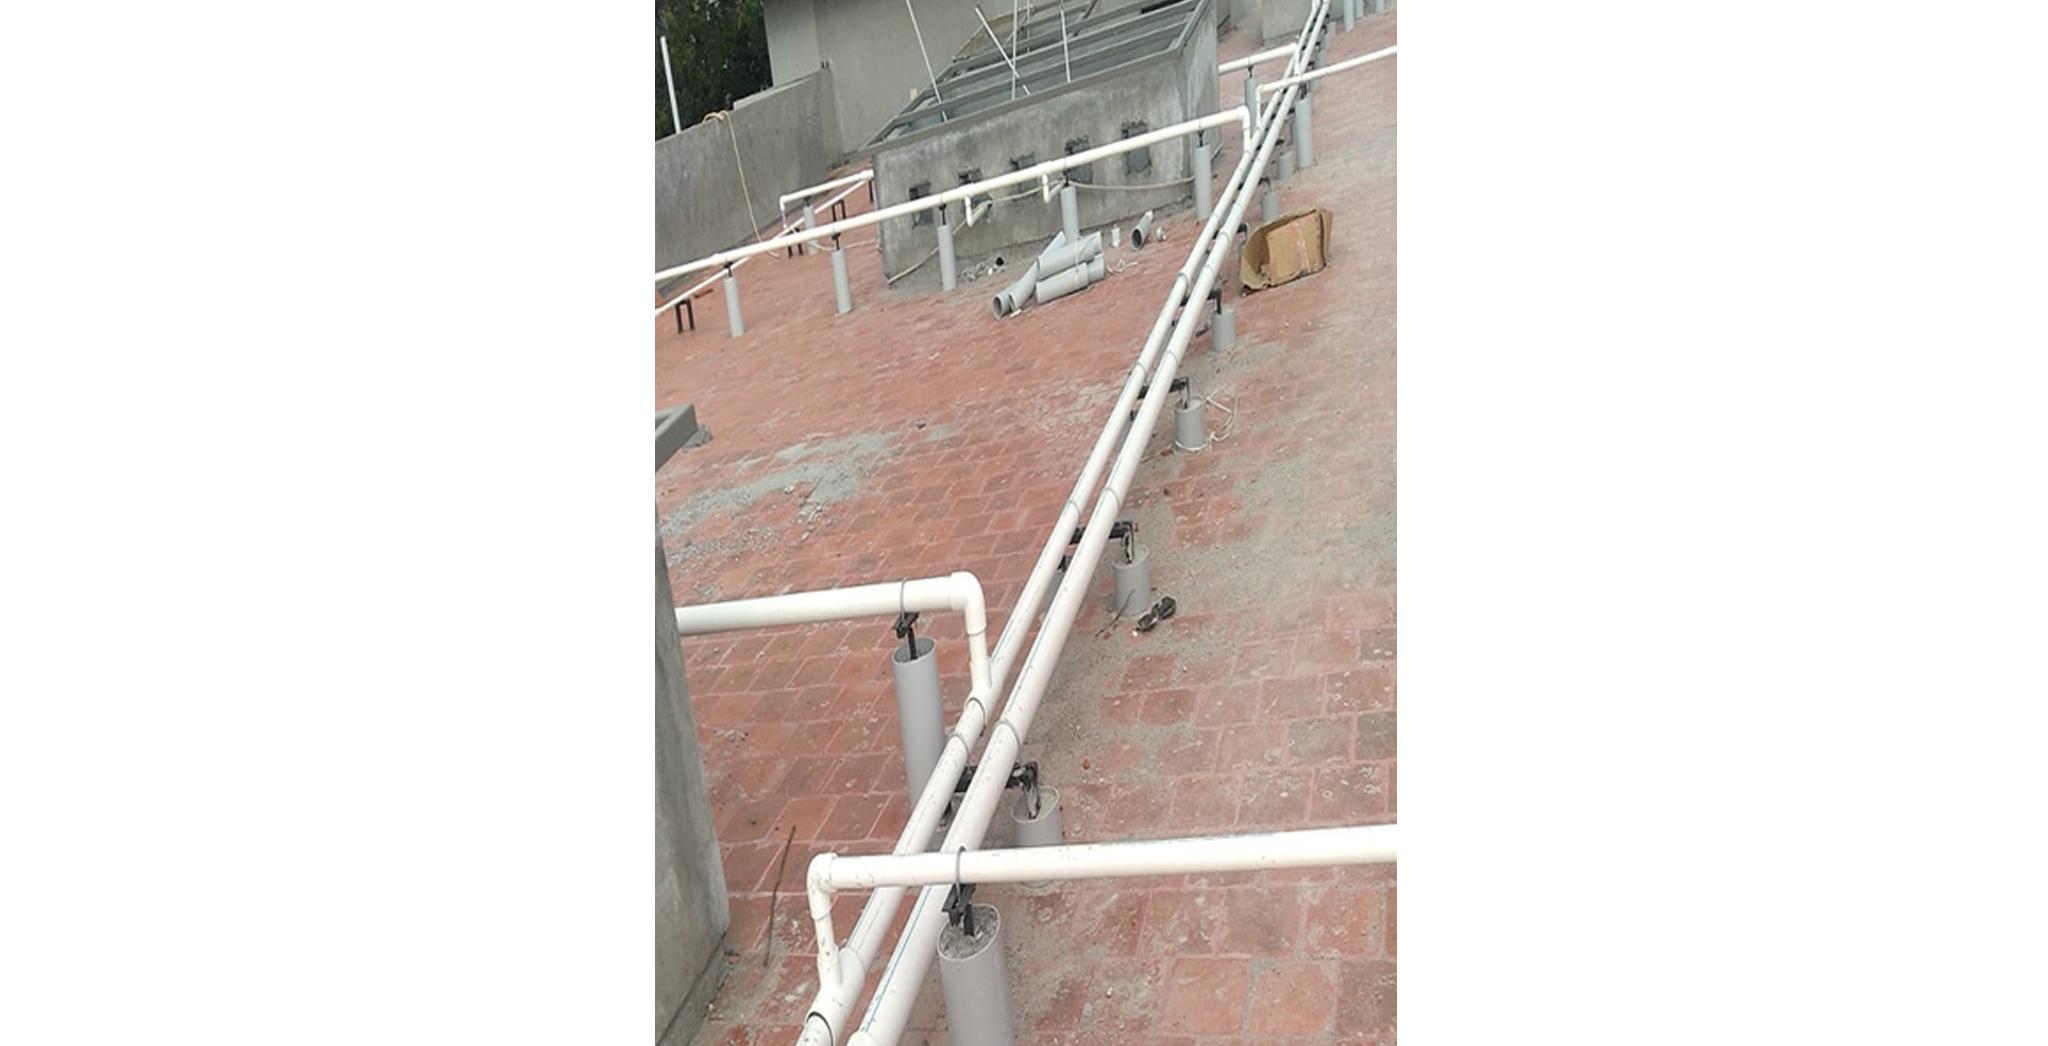 Aug 2021 - F Block: Terrace Piping work in progress